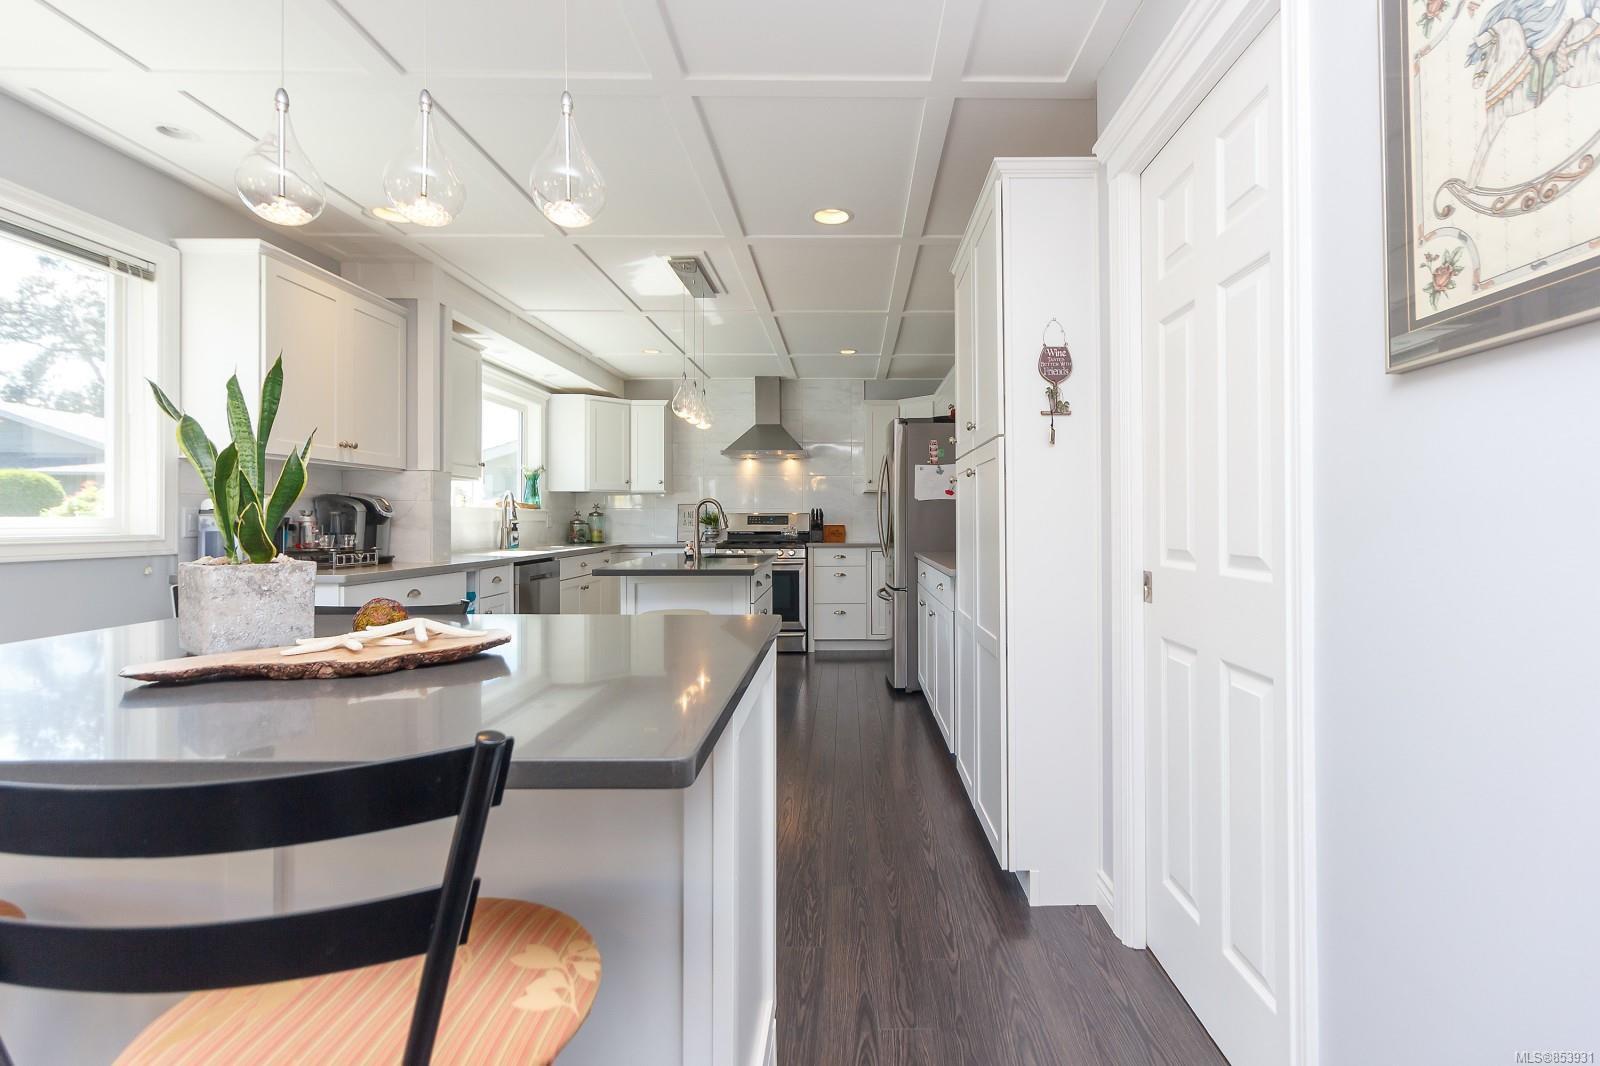 Photo 10: Photos: 2456 Timbercrest Dr in : Du East Duncan House for sale (Duncan)  : MLS®# 853931